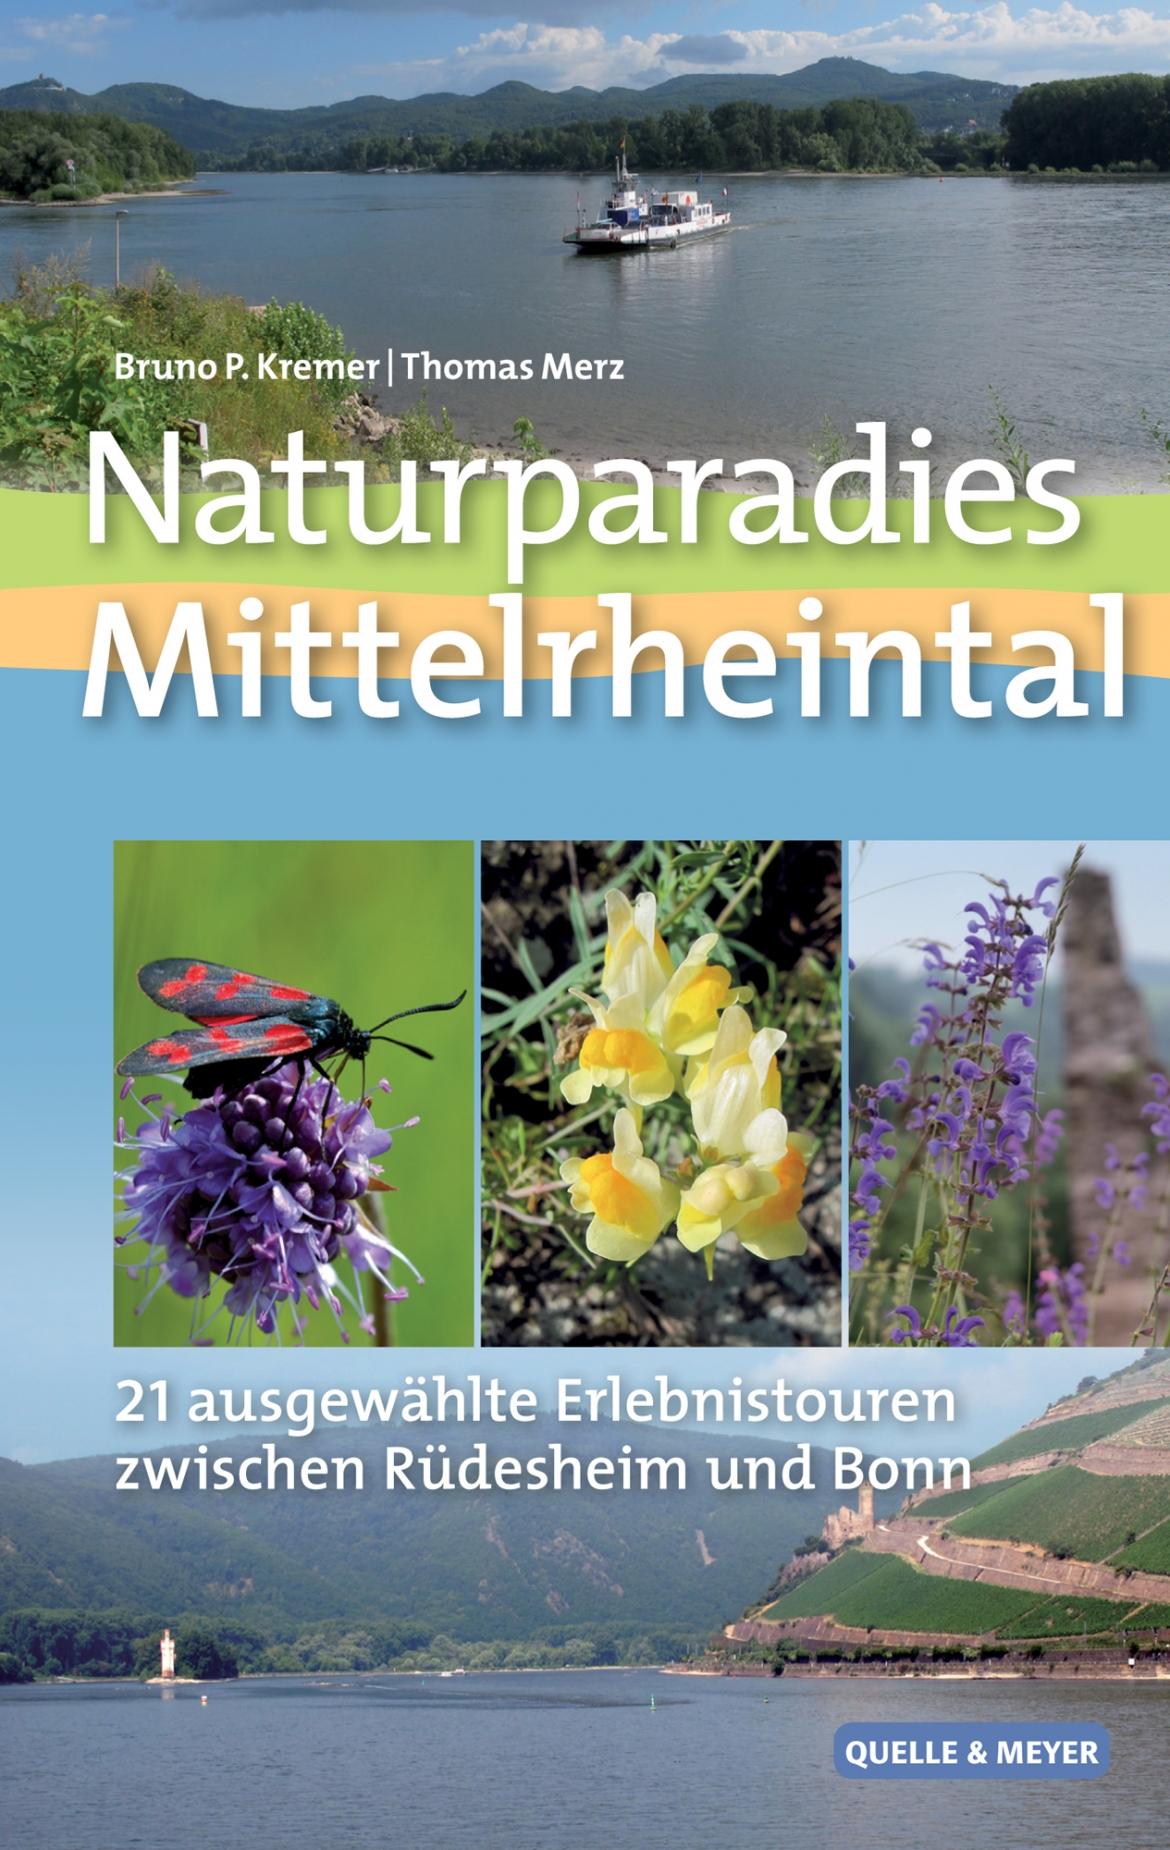 Kremer-Naturparadies-Mittelrheintal.jpg